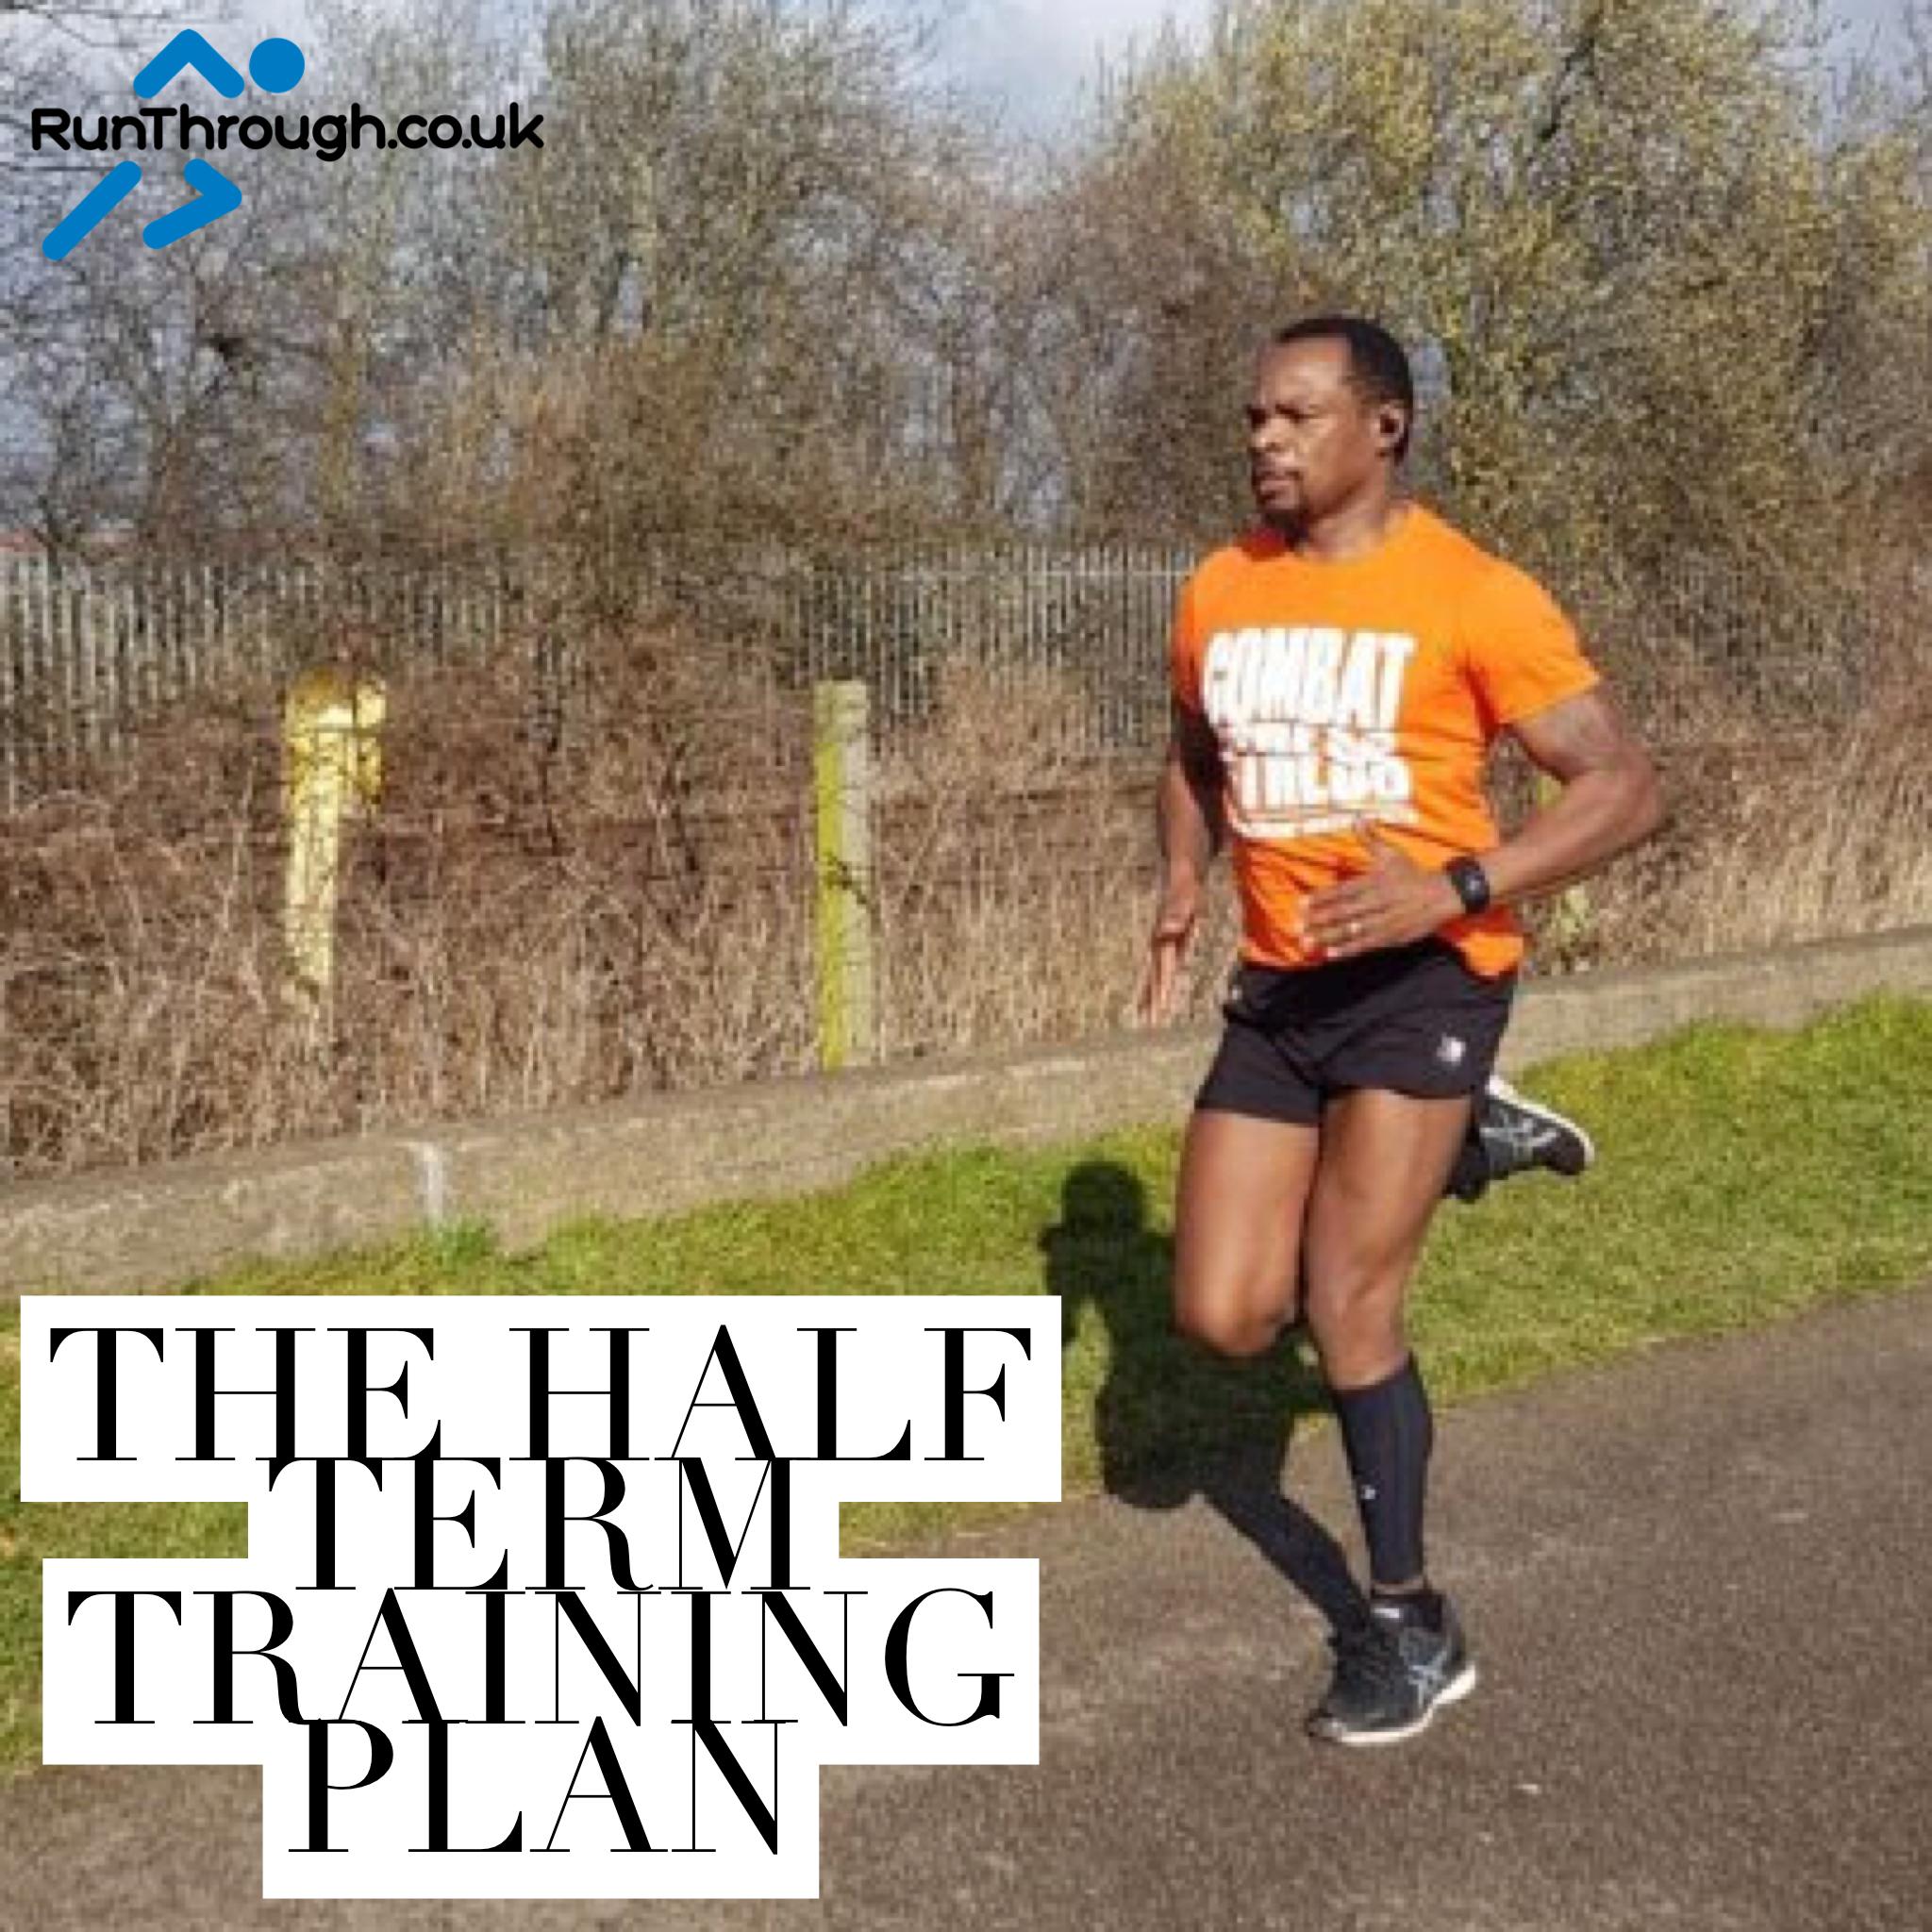 The half term training plan